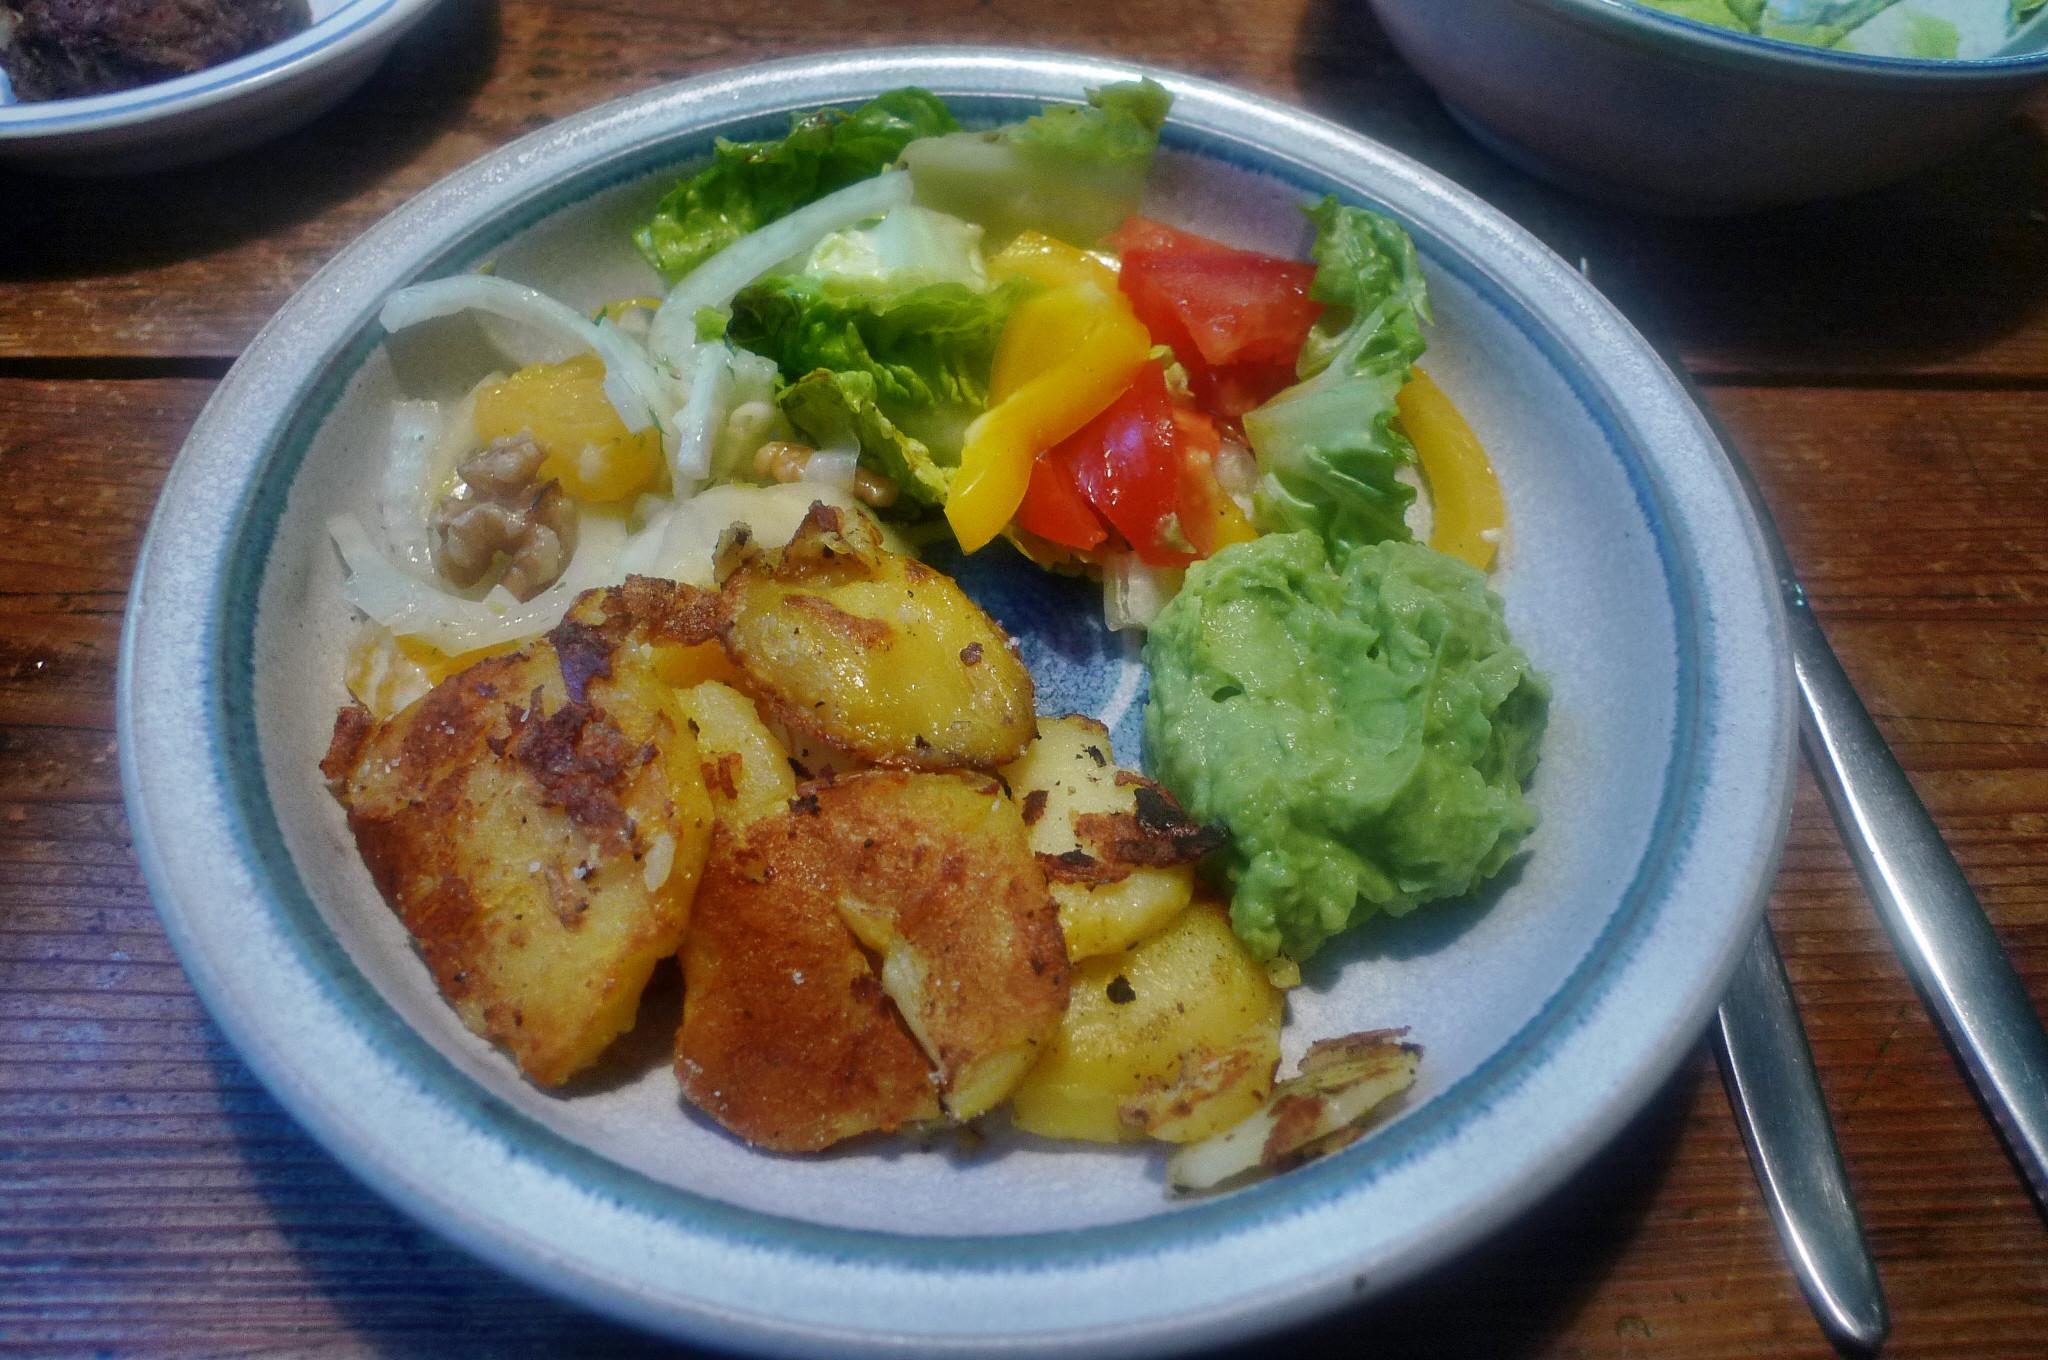 Guacamole,Fenchelsalat,Salat,Bratkartoffel--22.1.15   (12)